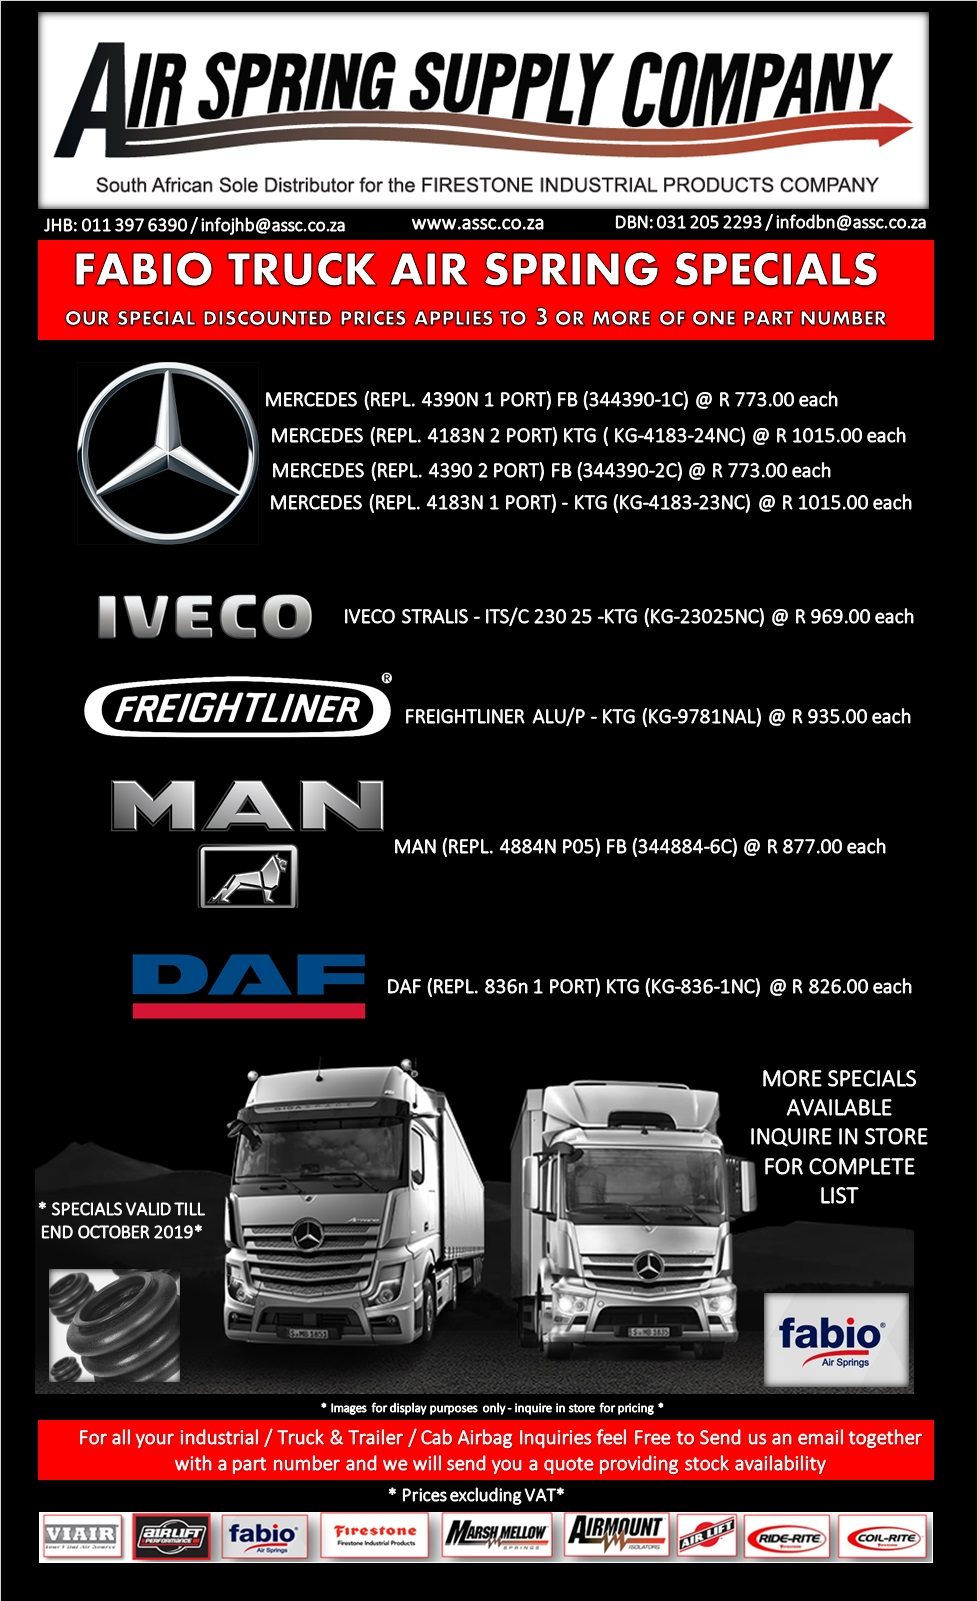 Truck / Trailer Air Bag Specials - Fabio - Firestone